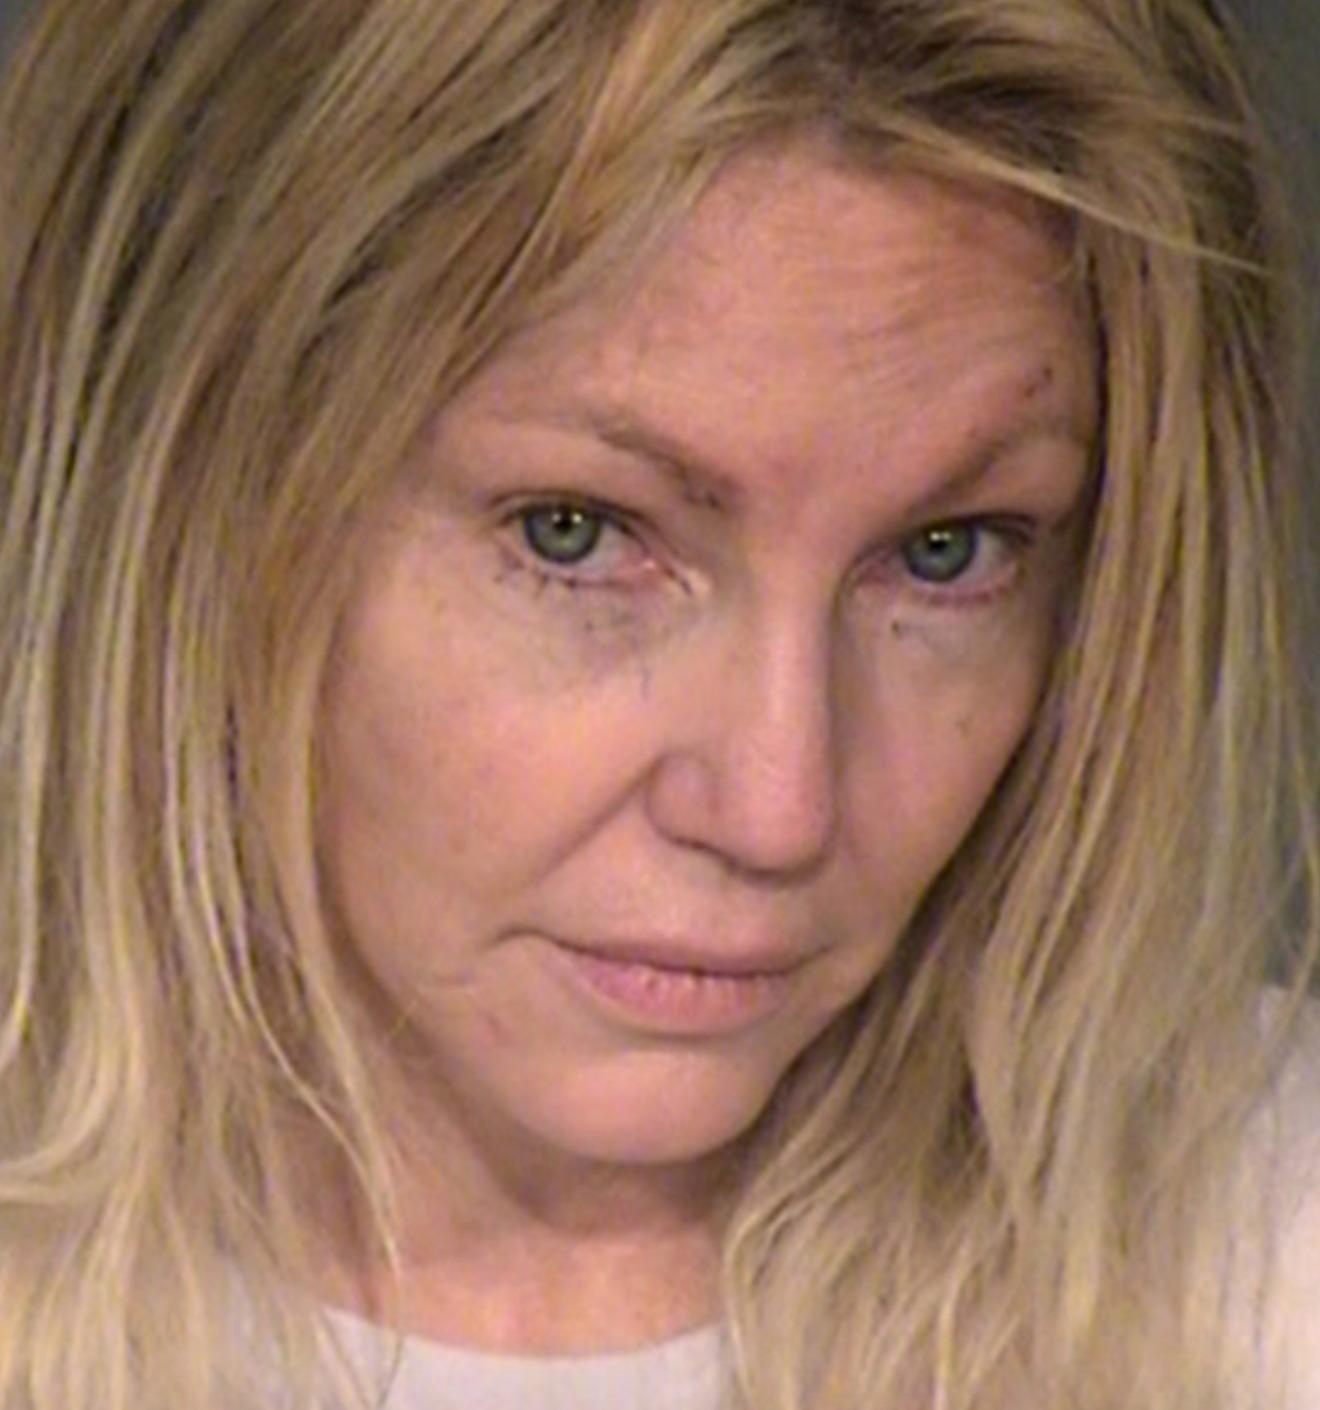 Heather Locklear oggi salute alcol arresti ricovero